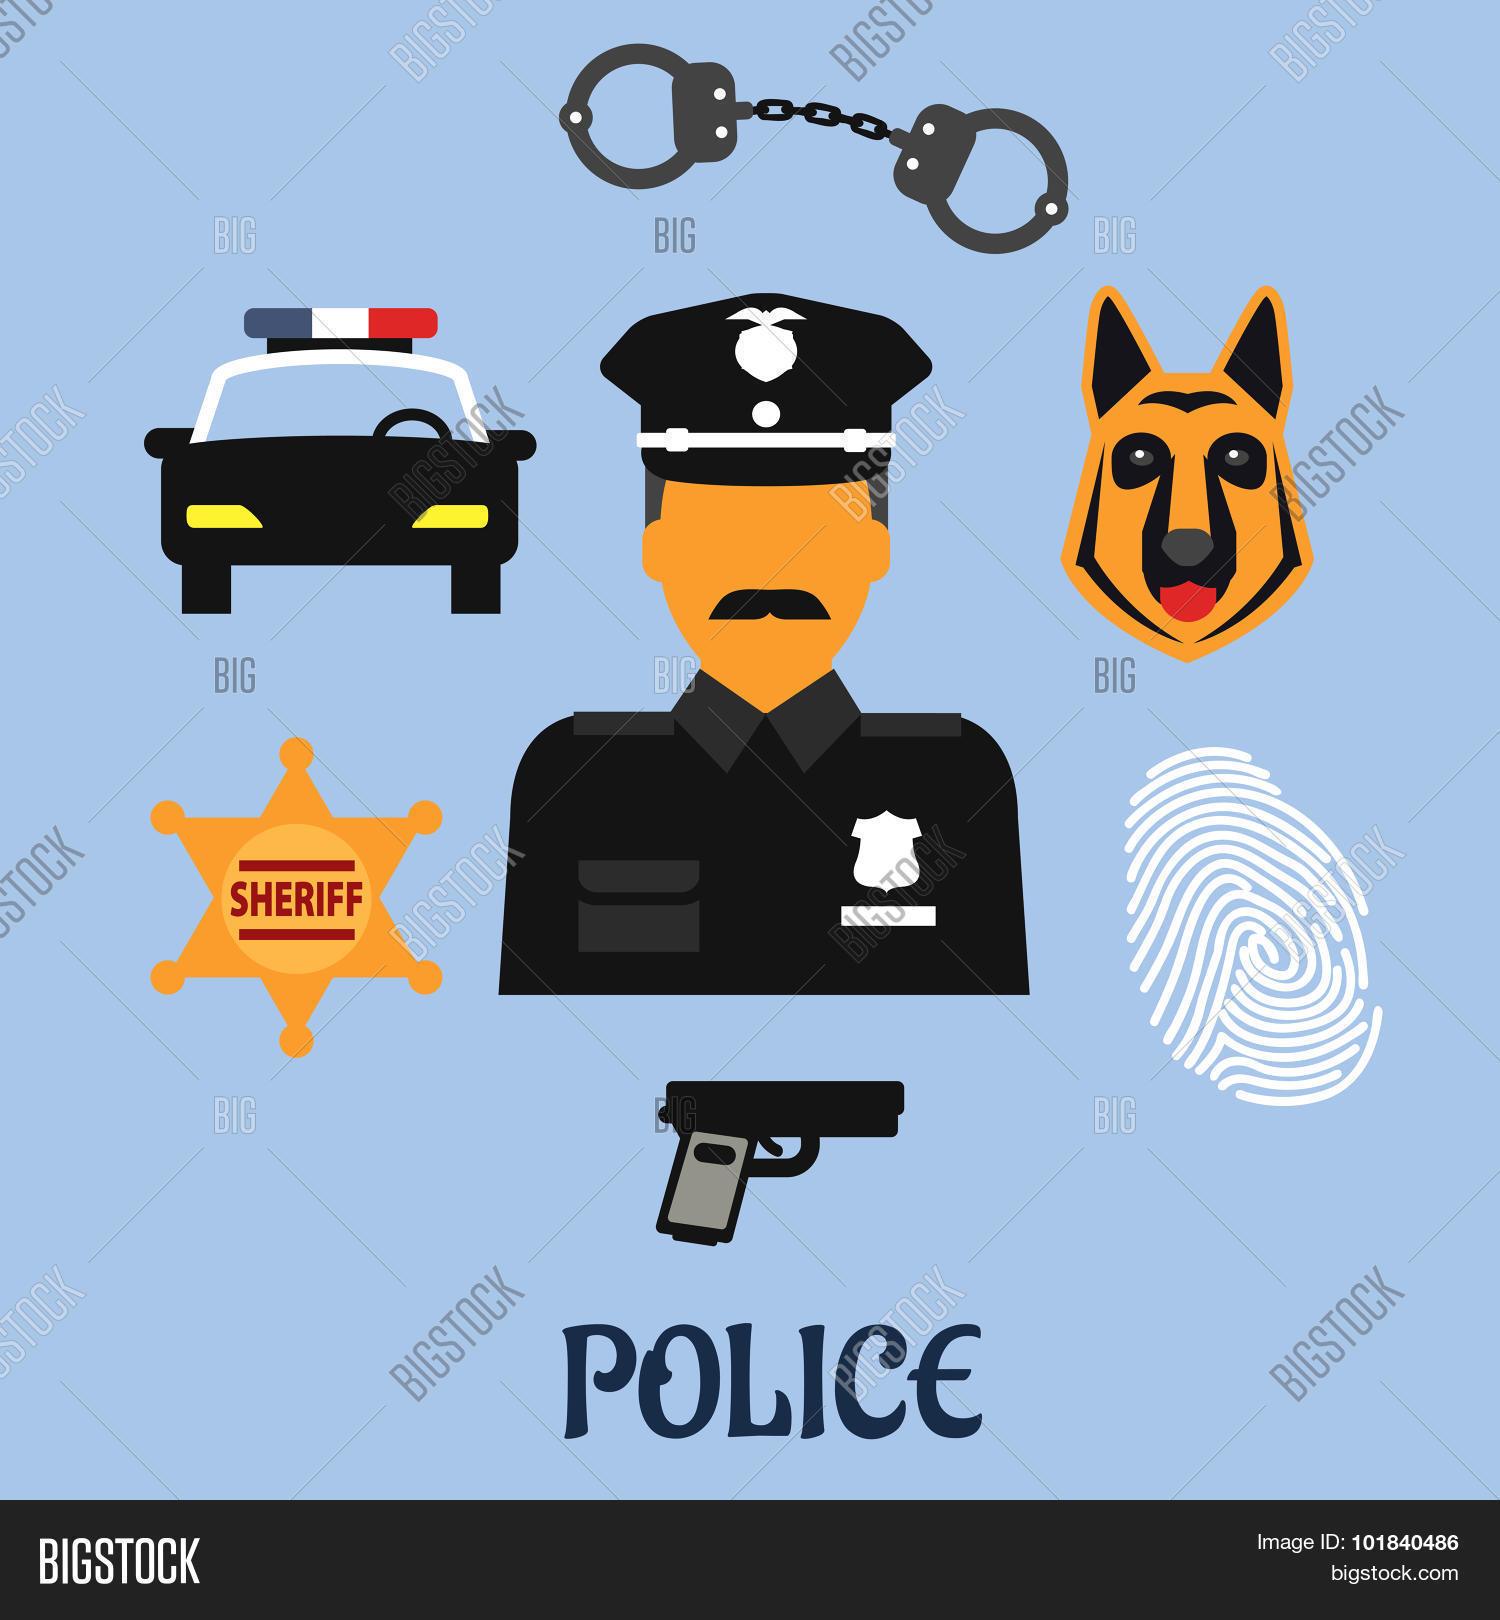 Police Profession Vector Photo Free Trial Bigstock